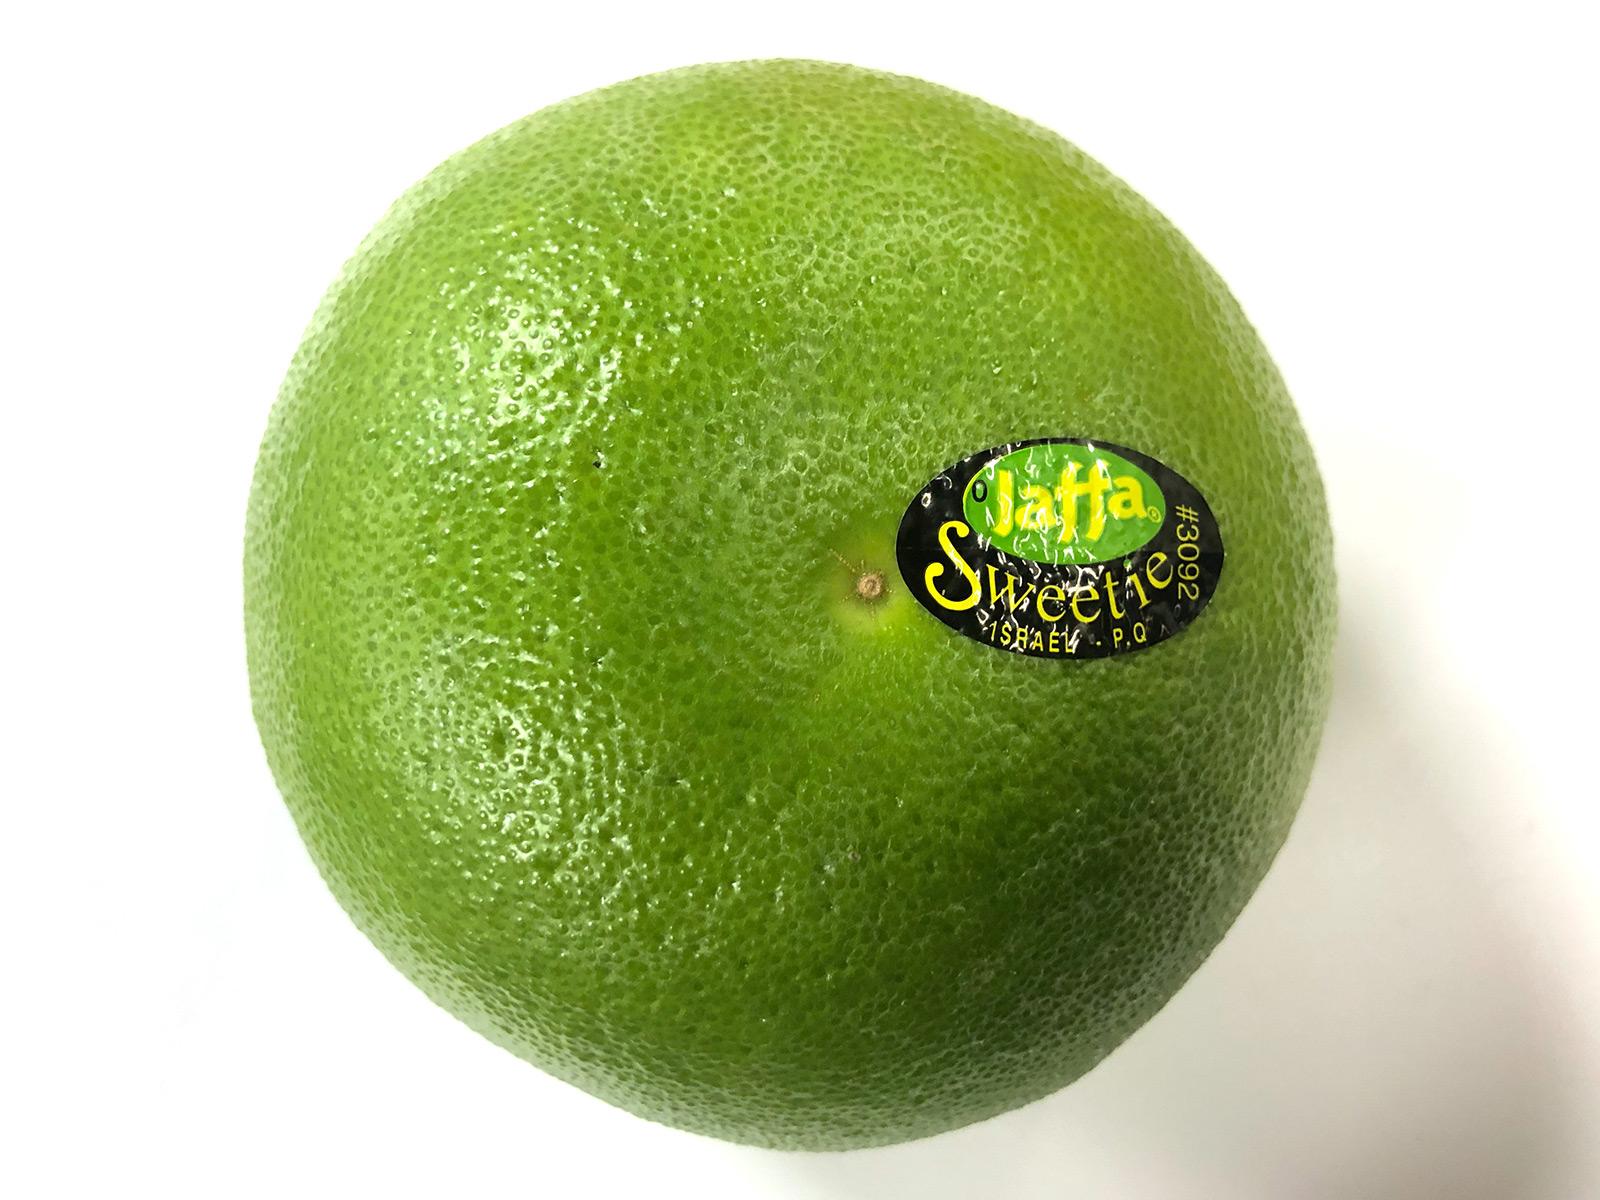 3092-jaffa-sweetie-grapefruit.jpg